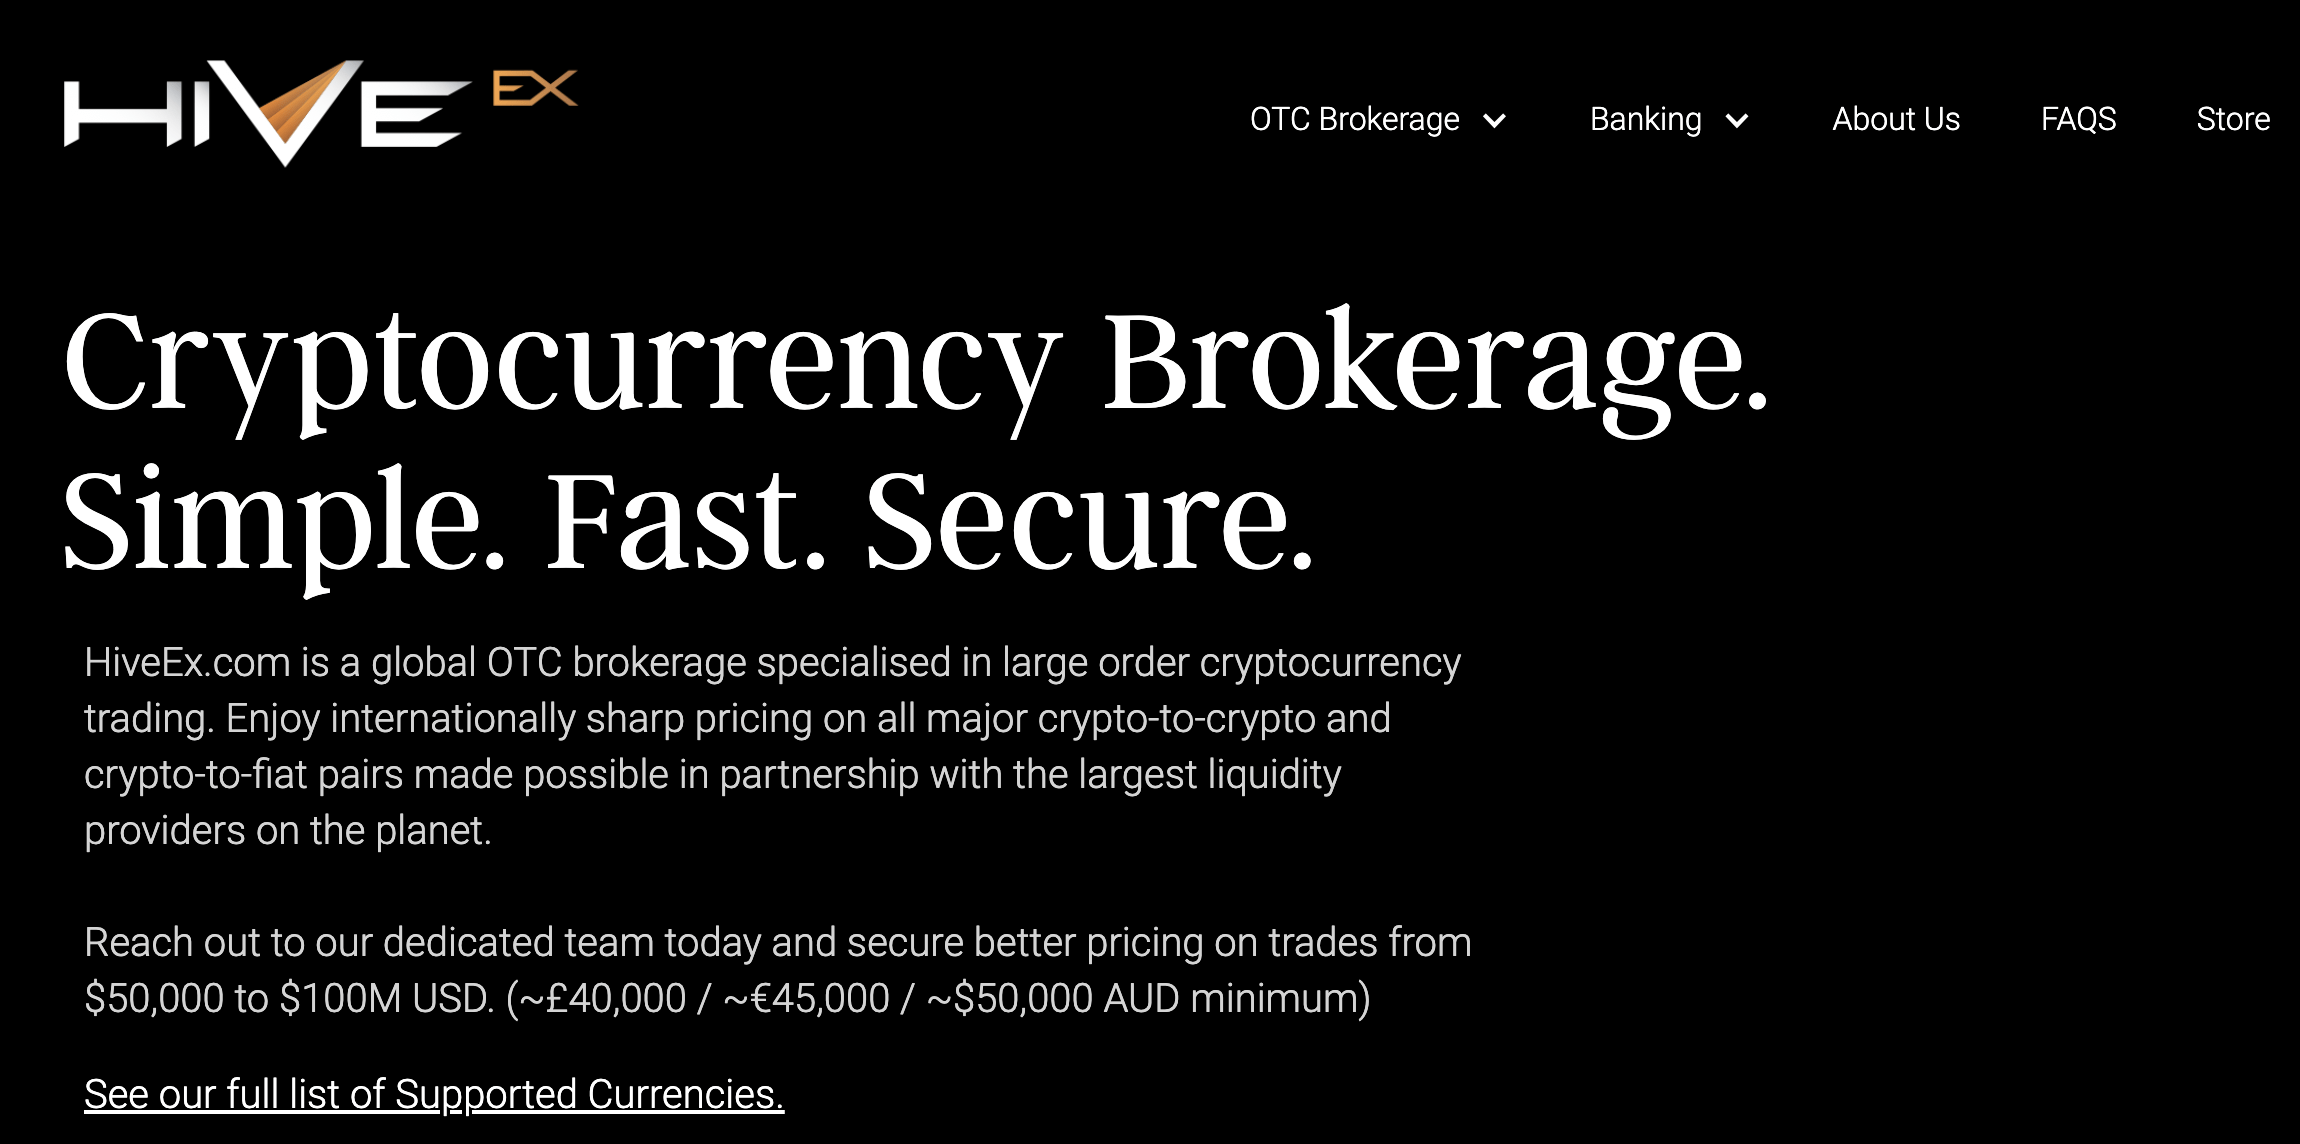 otc cryptocurrency trader job